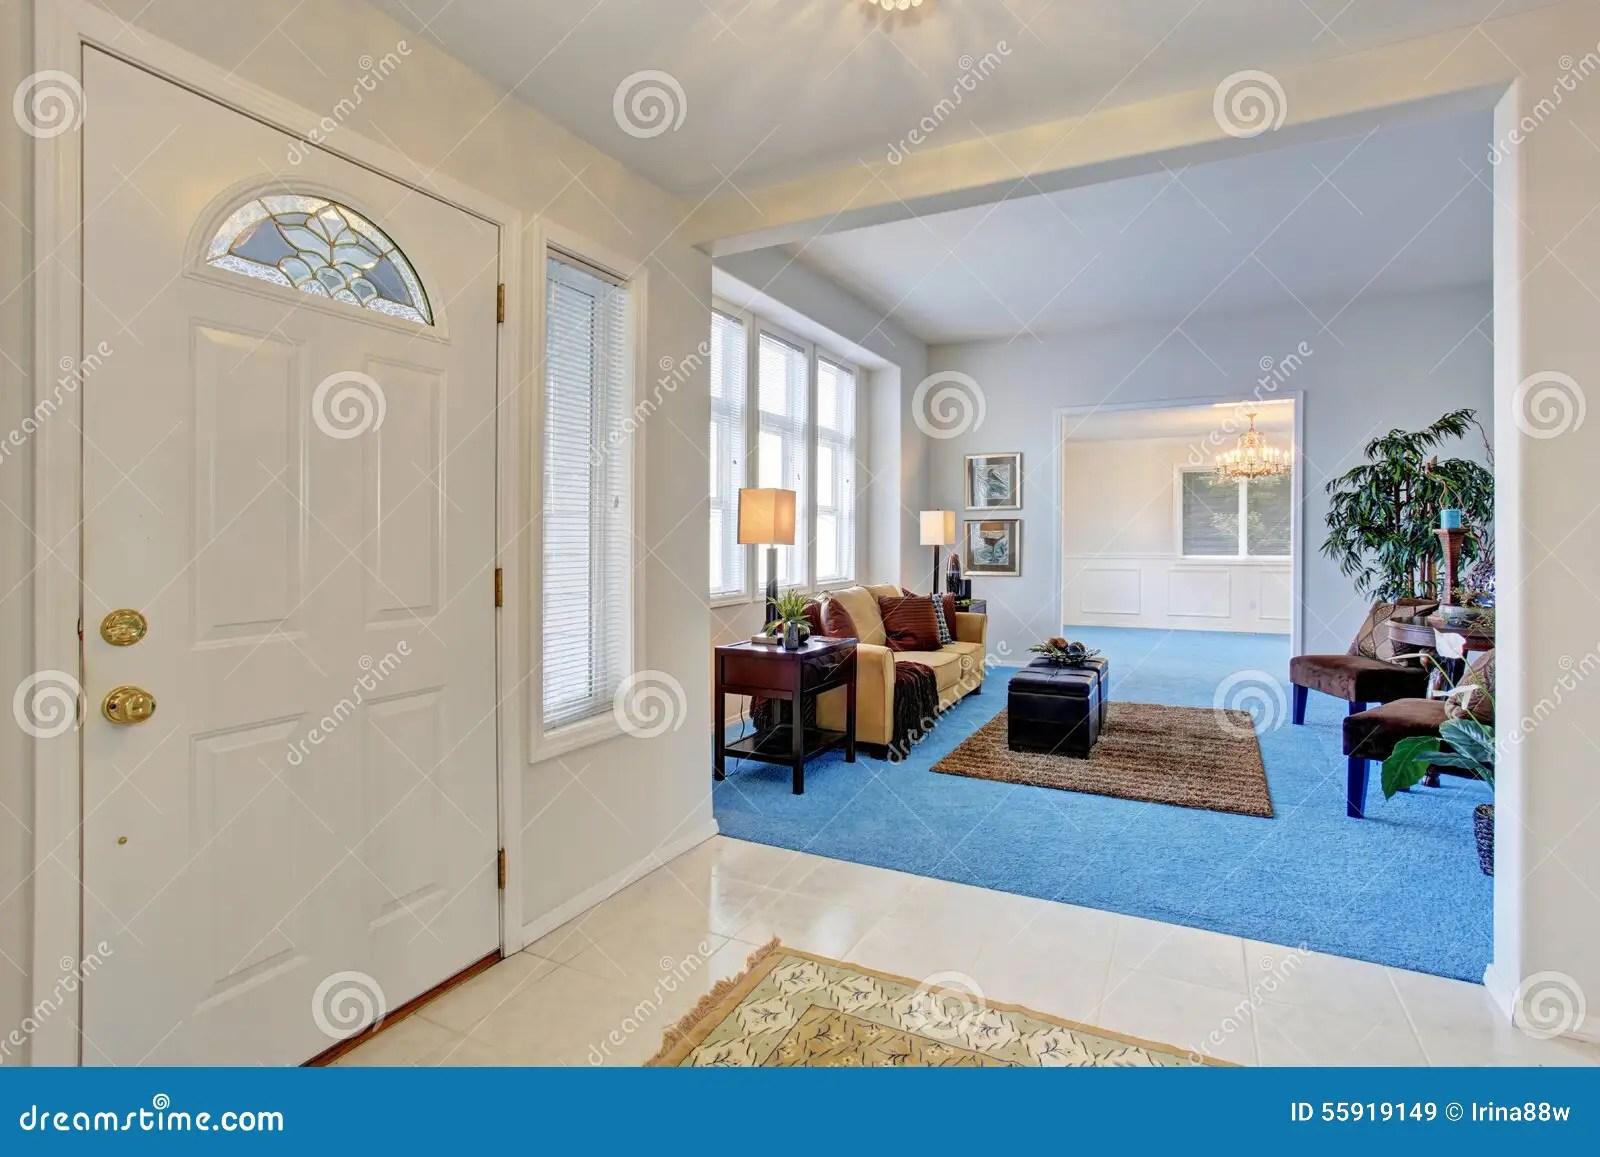 blue kitchen rugs kwc faucets 有明亮的蓝色地毯的georgous客厅库存图片 图片包括有闪亮指示 实际 有明亮的蓝色地毯的georgous客厅